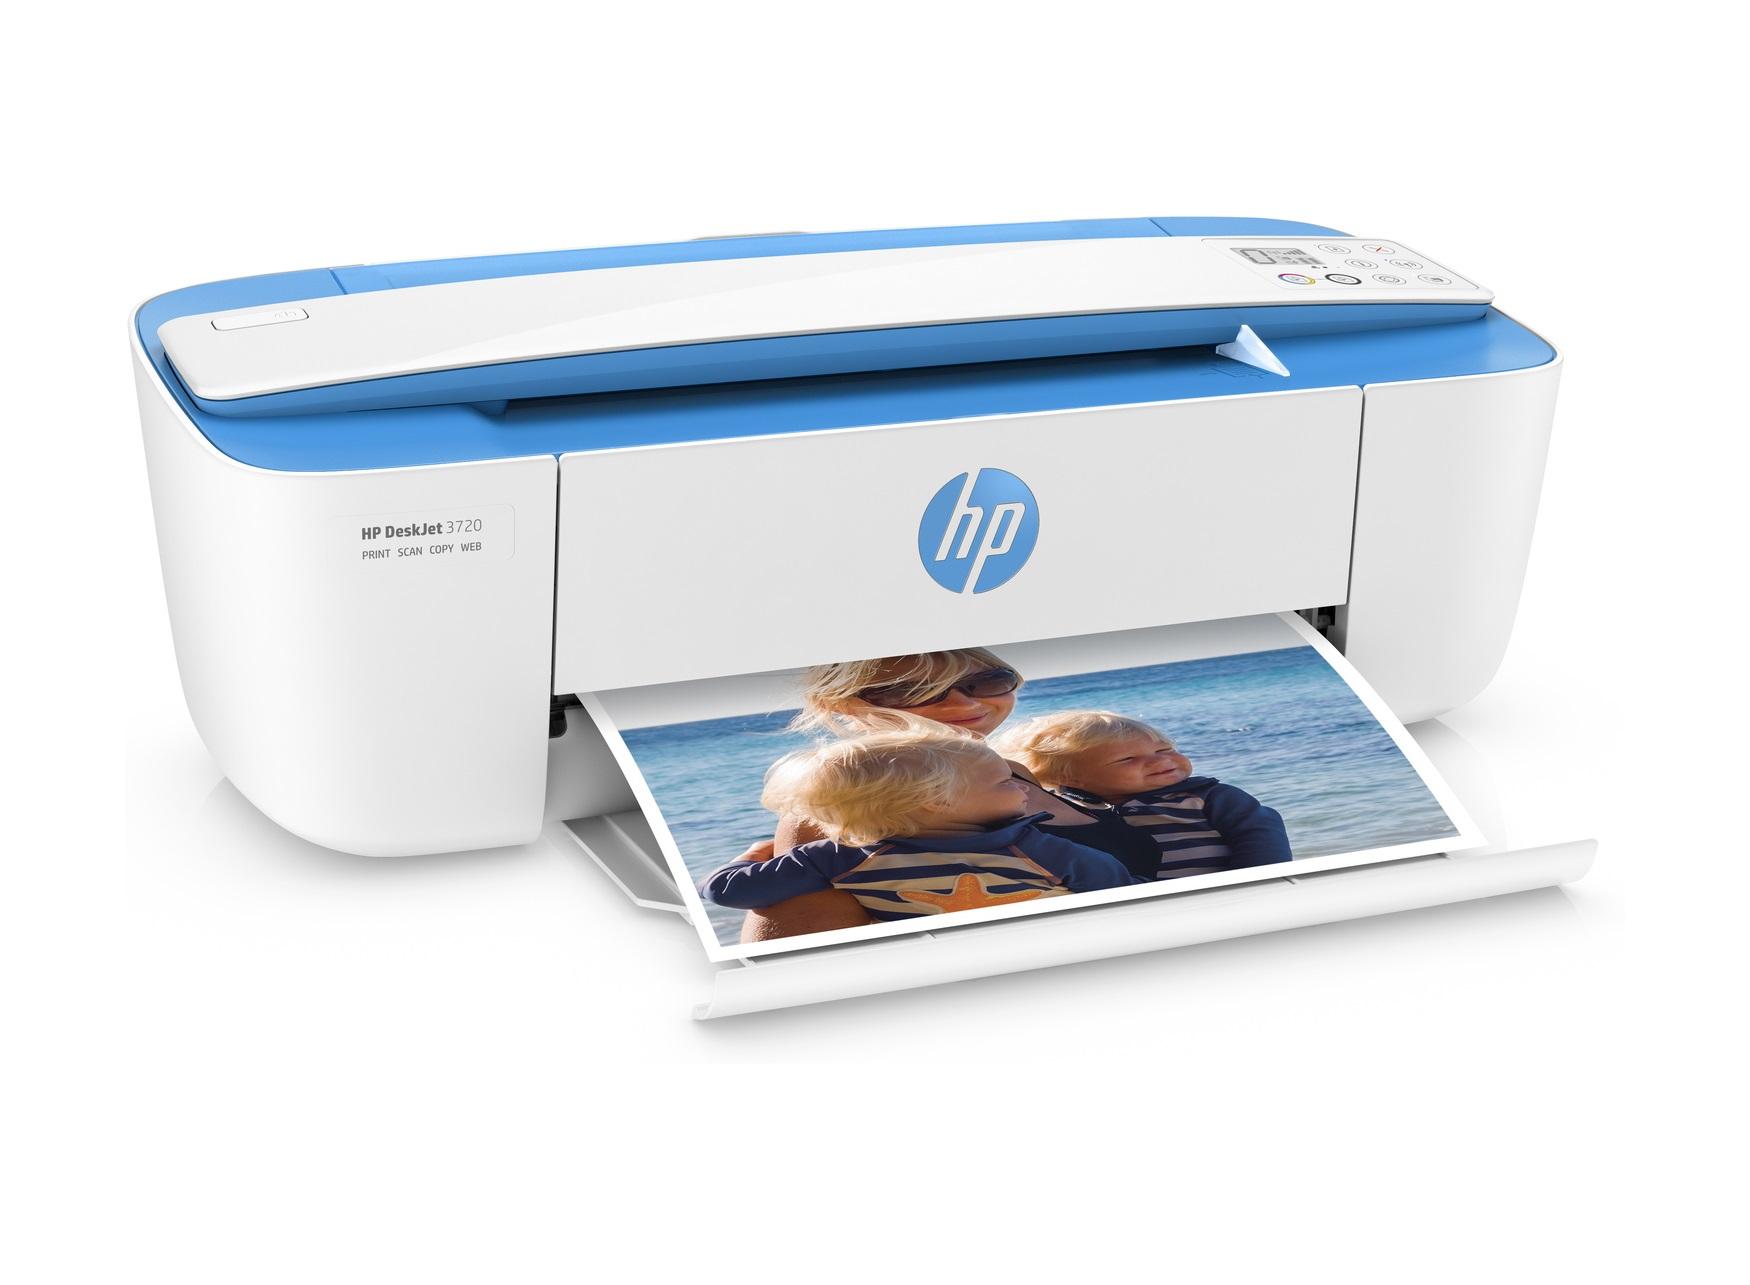 Inkntoneruk Blog | The latest news on printers, printer technology